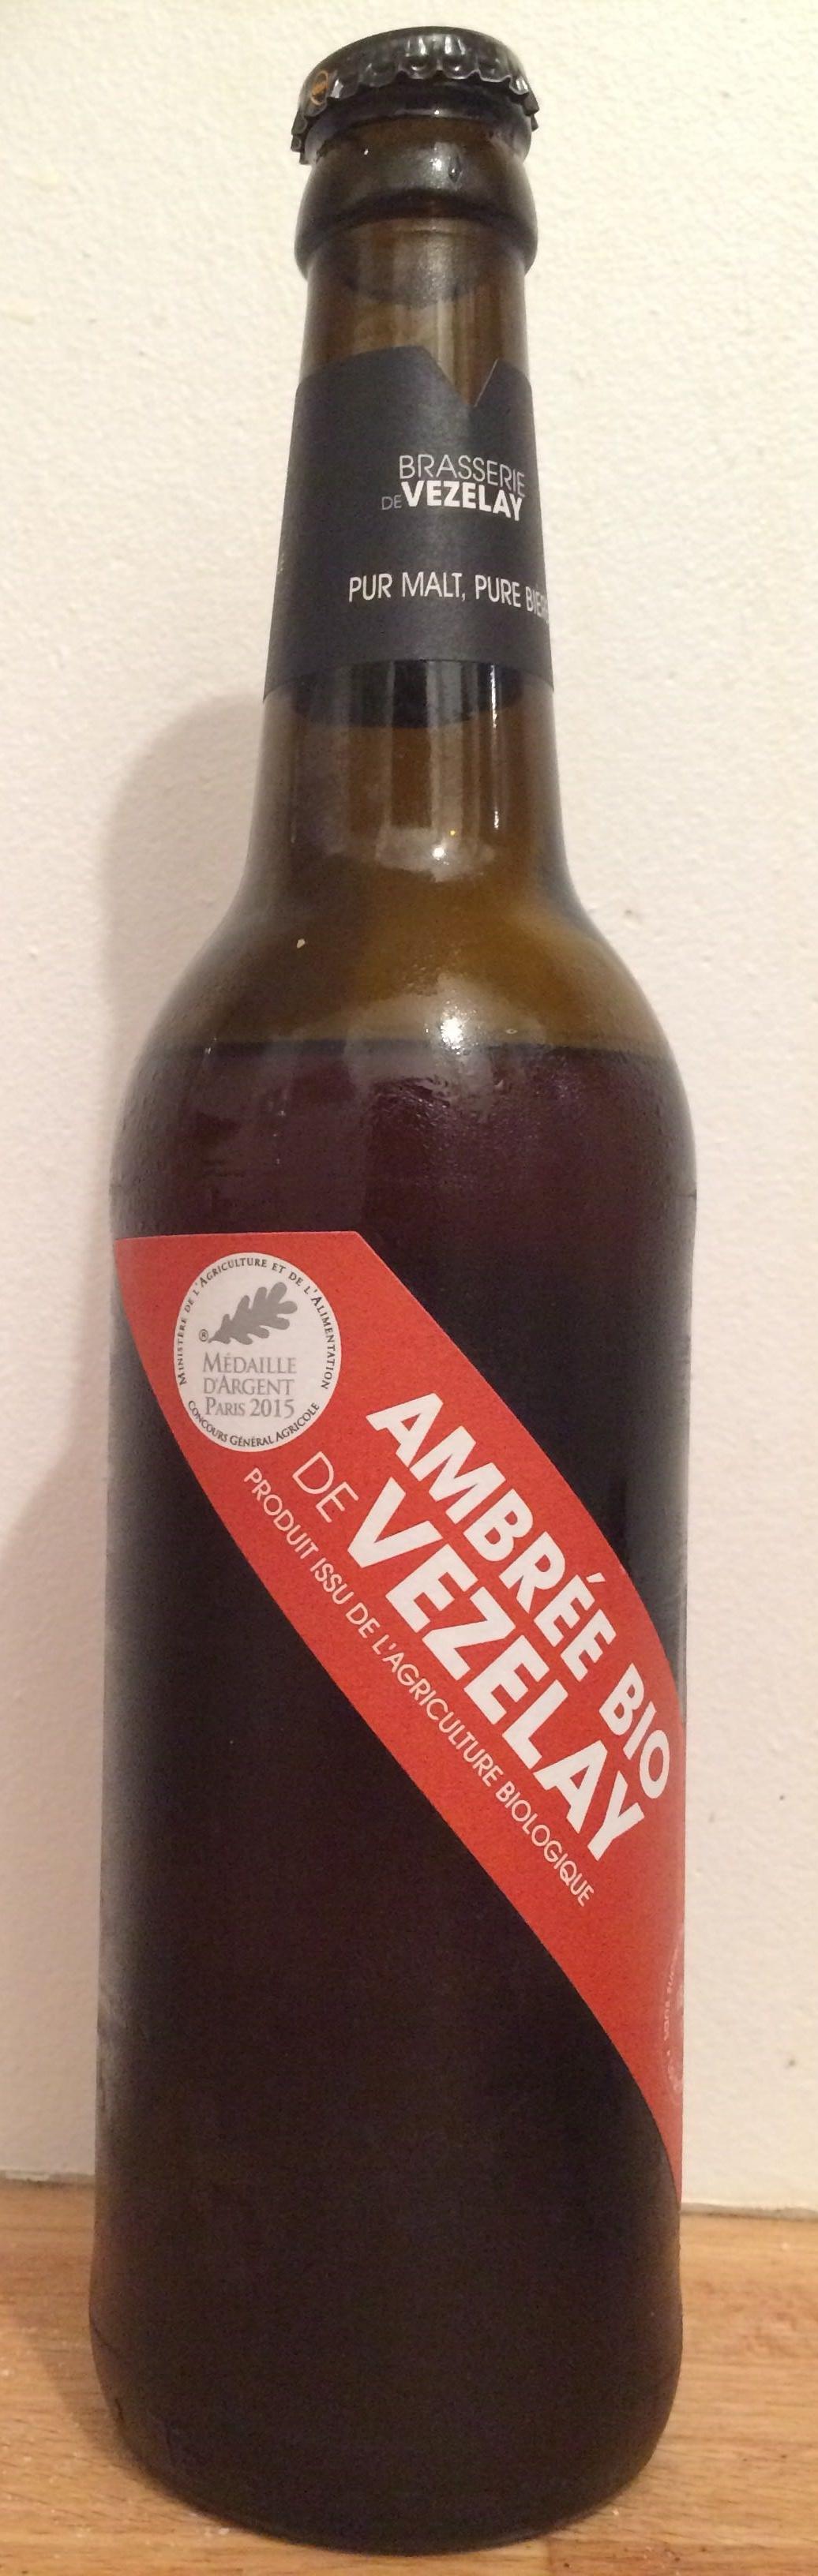 Ambré Bio de Vezelay - Product - fr